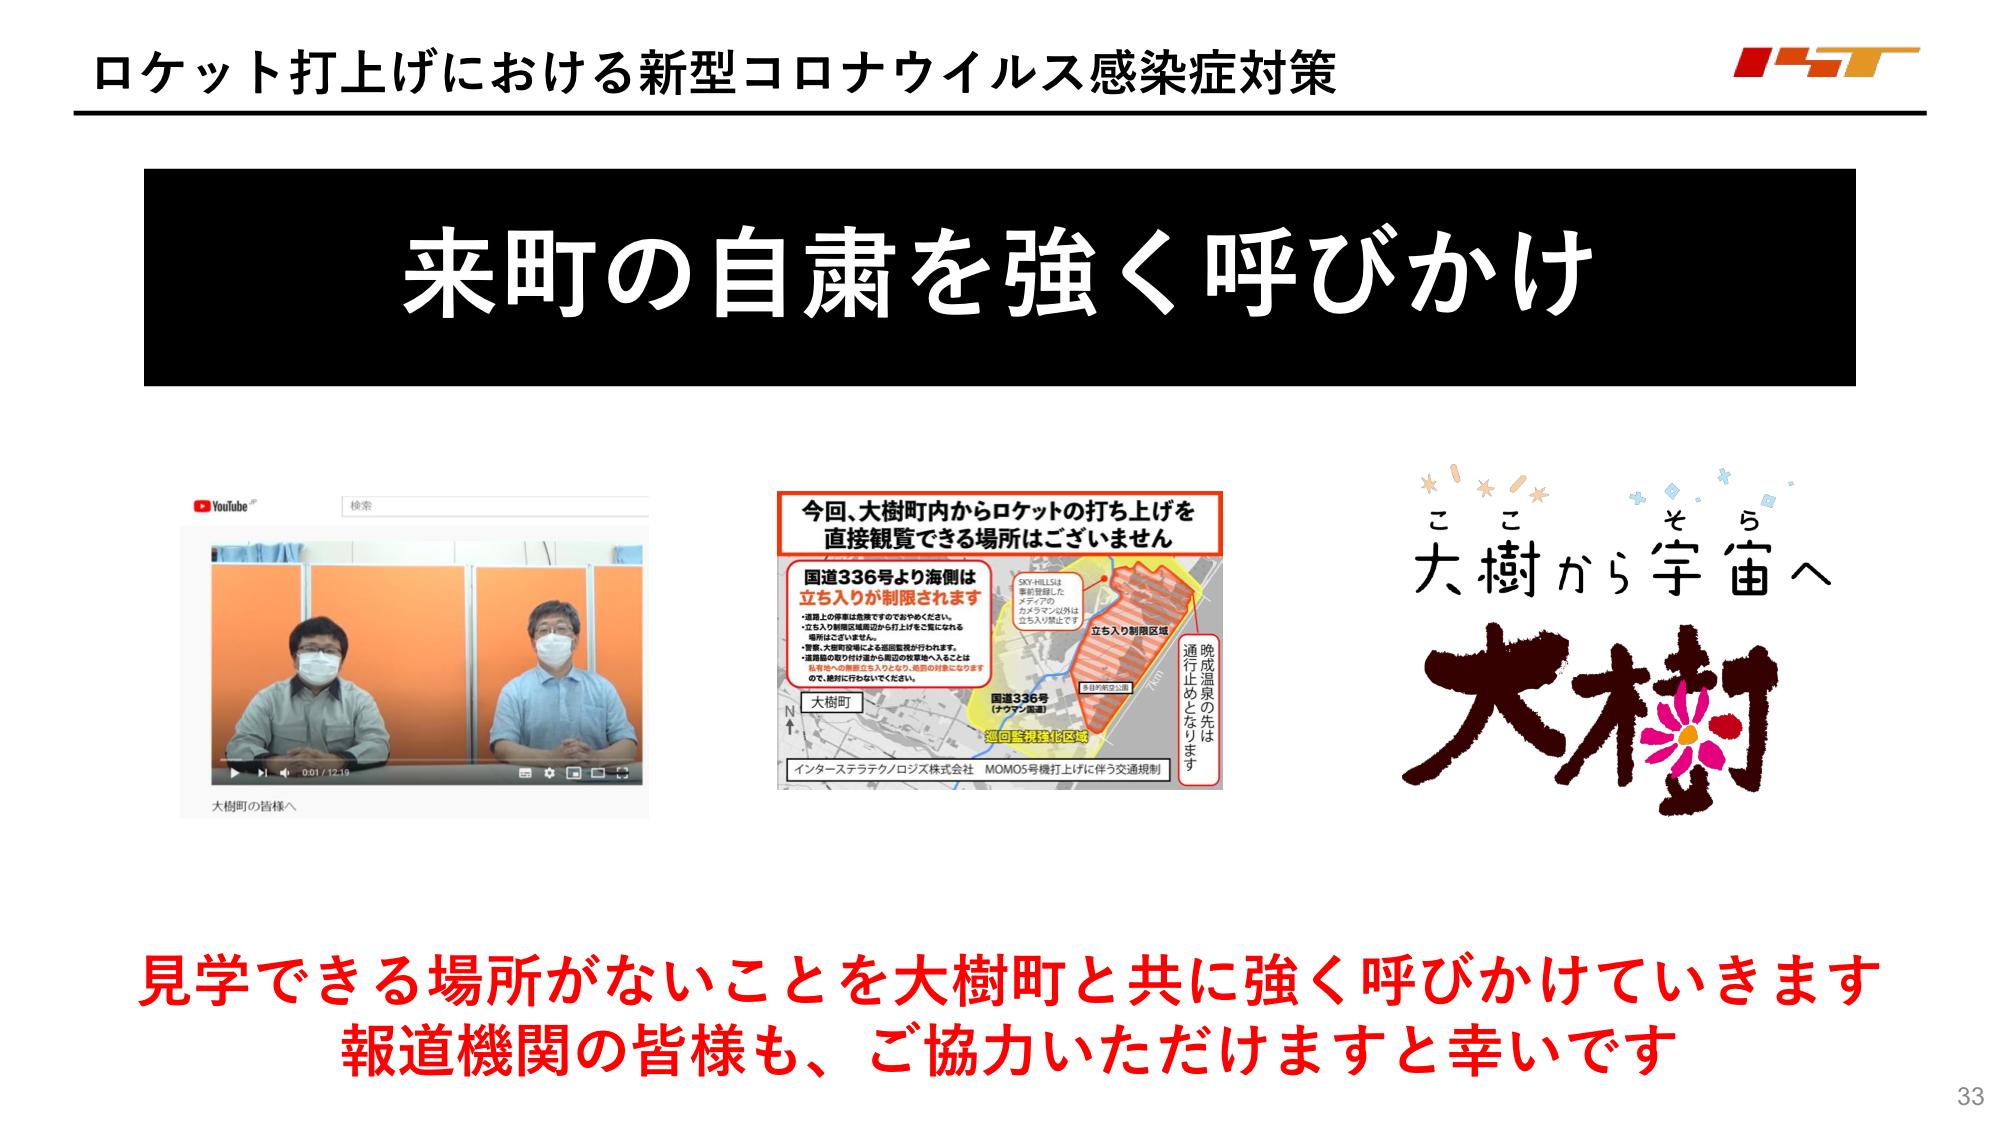 f:id:Imamura:20200603233012p:plain